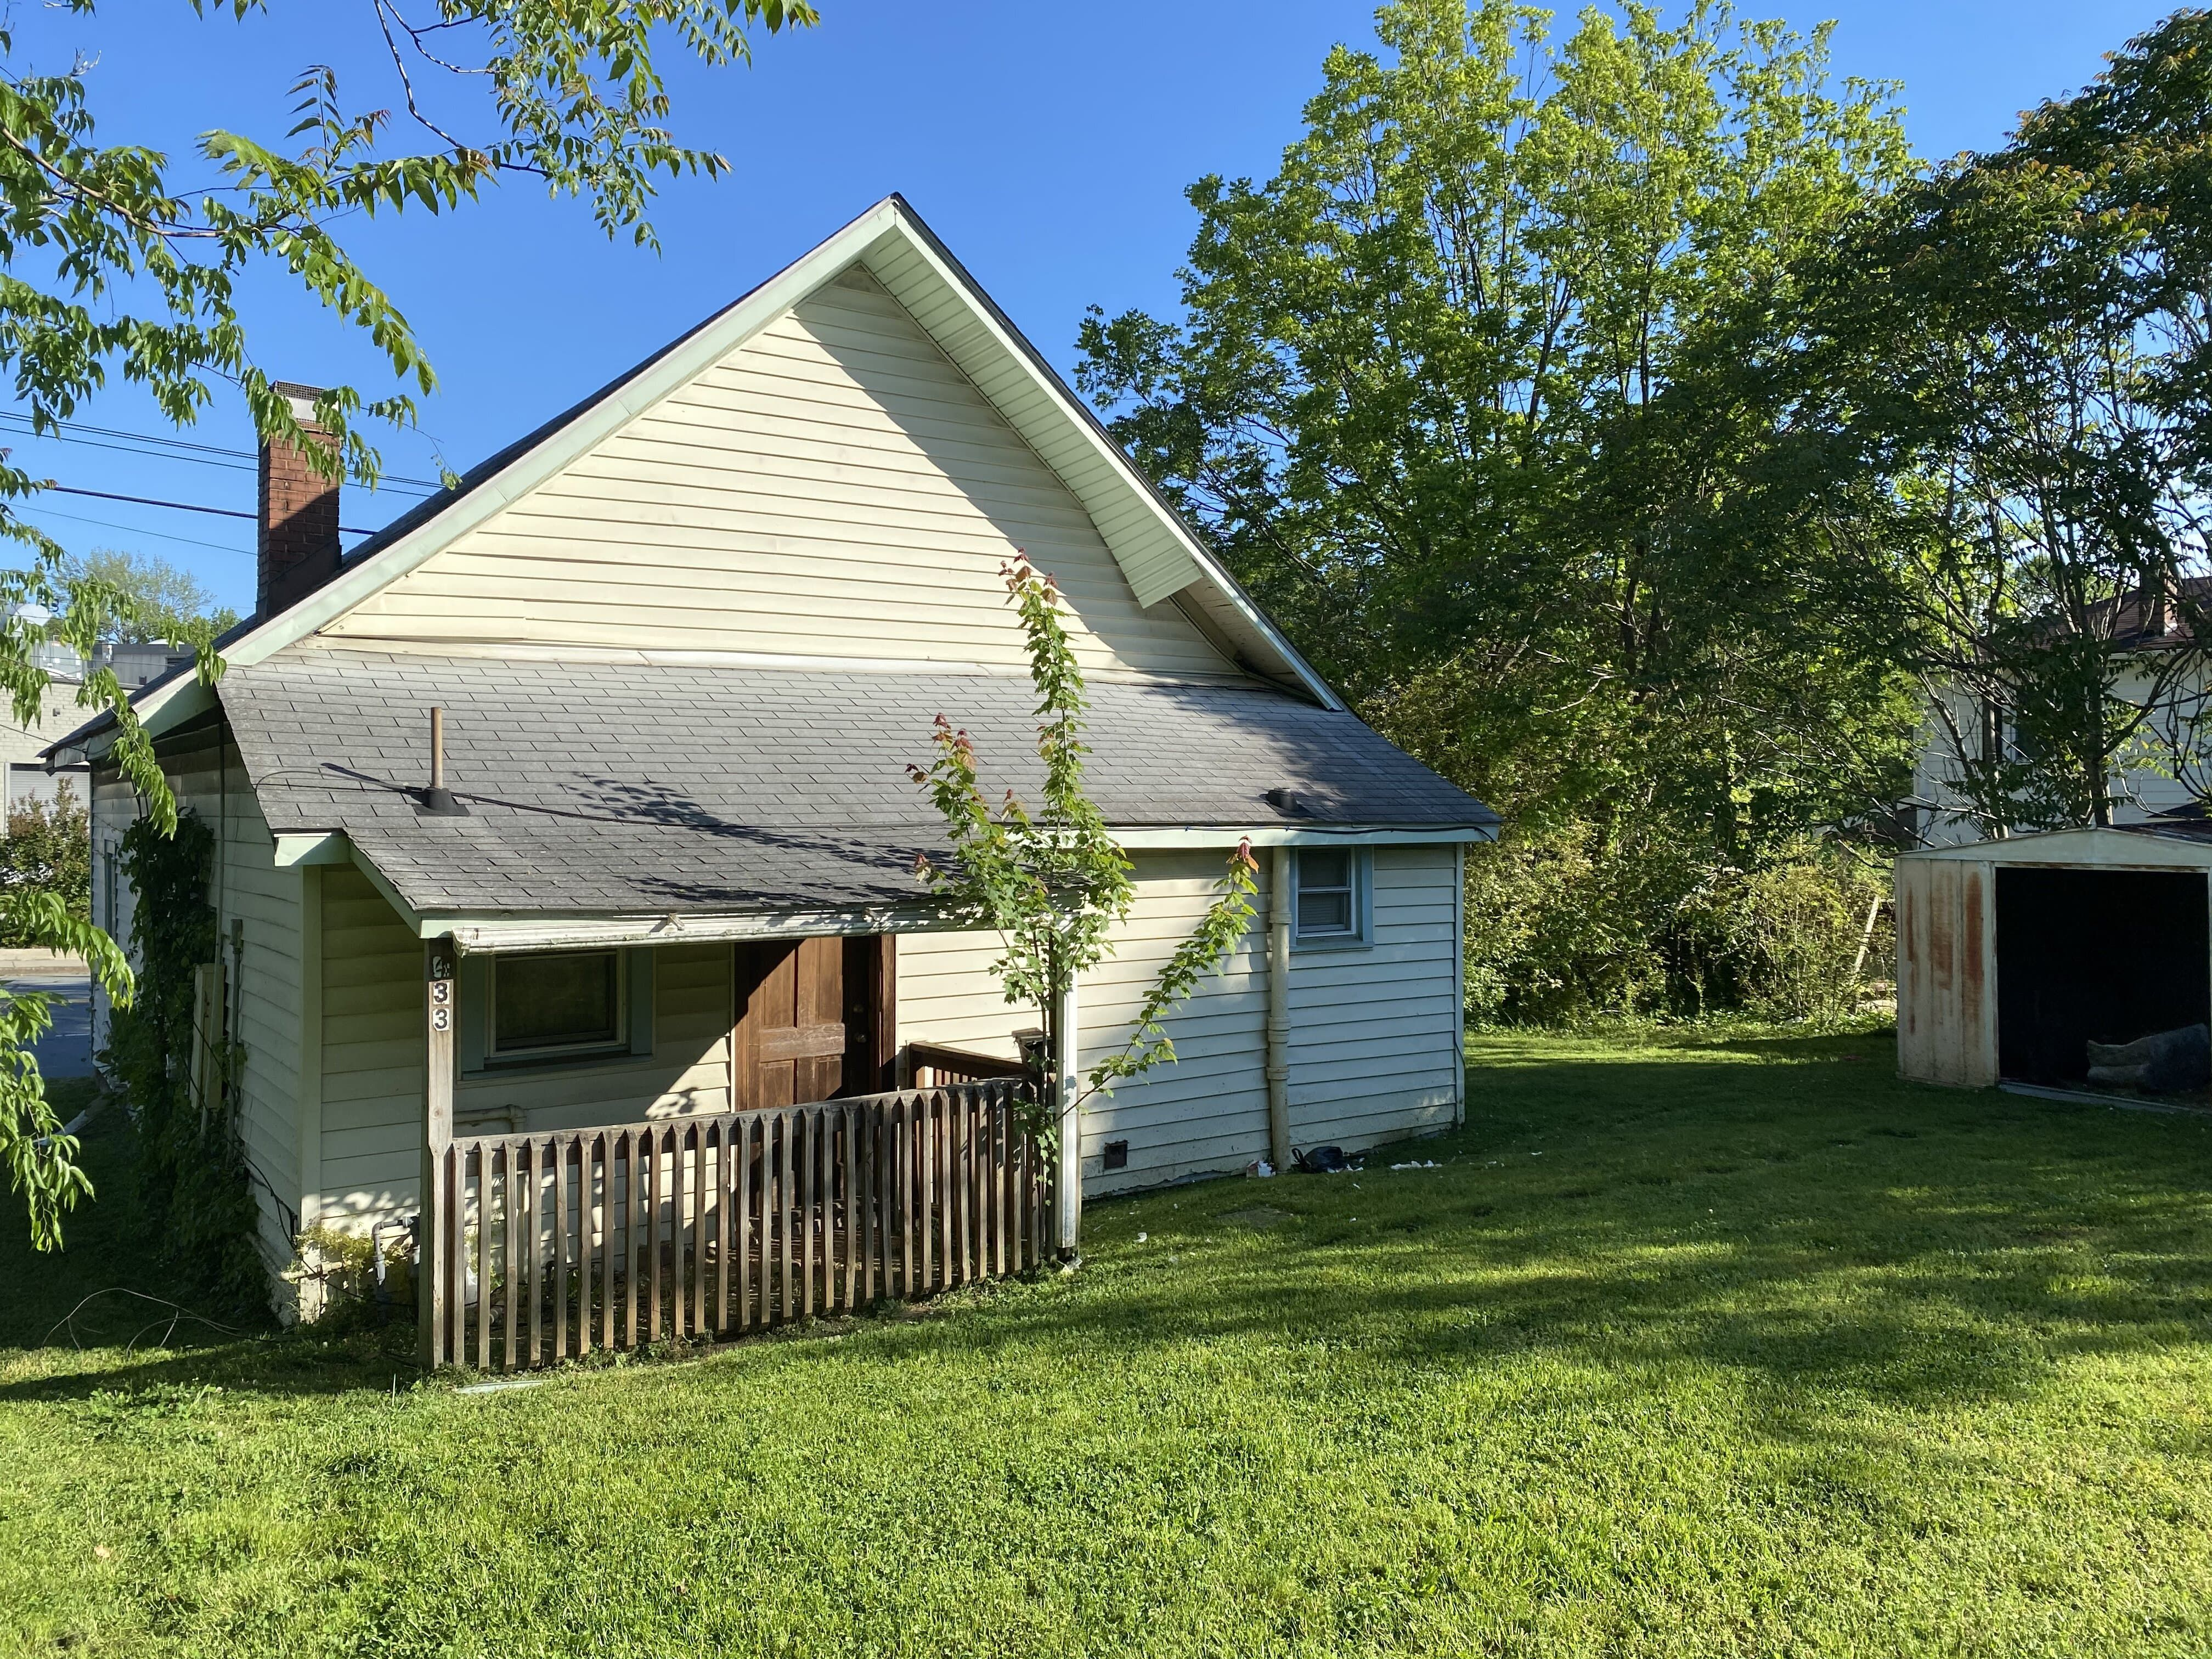 433 E Elm St, Graham, NC